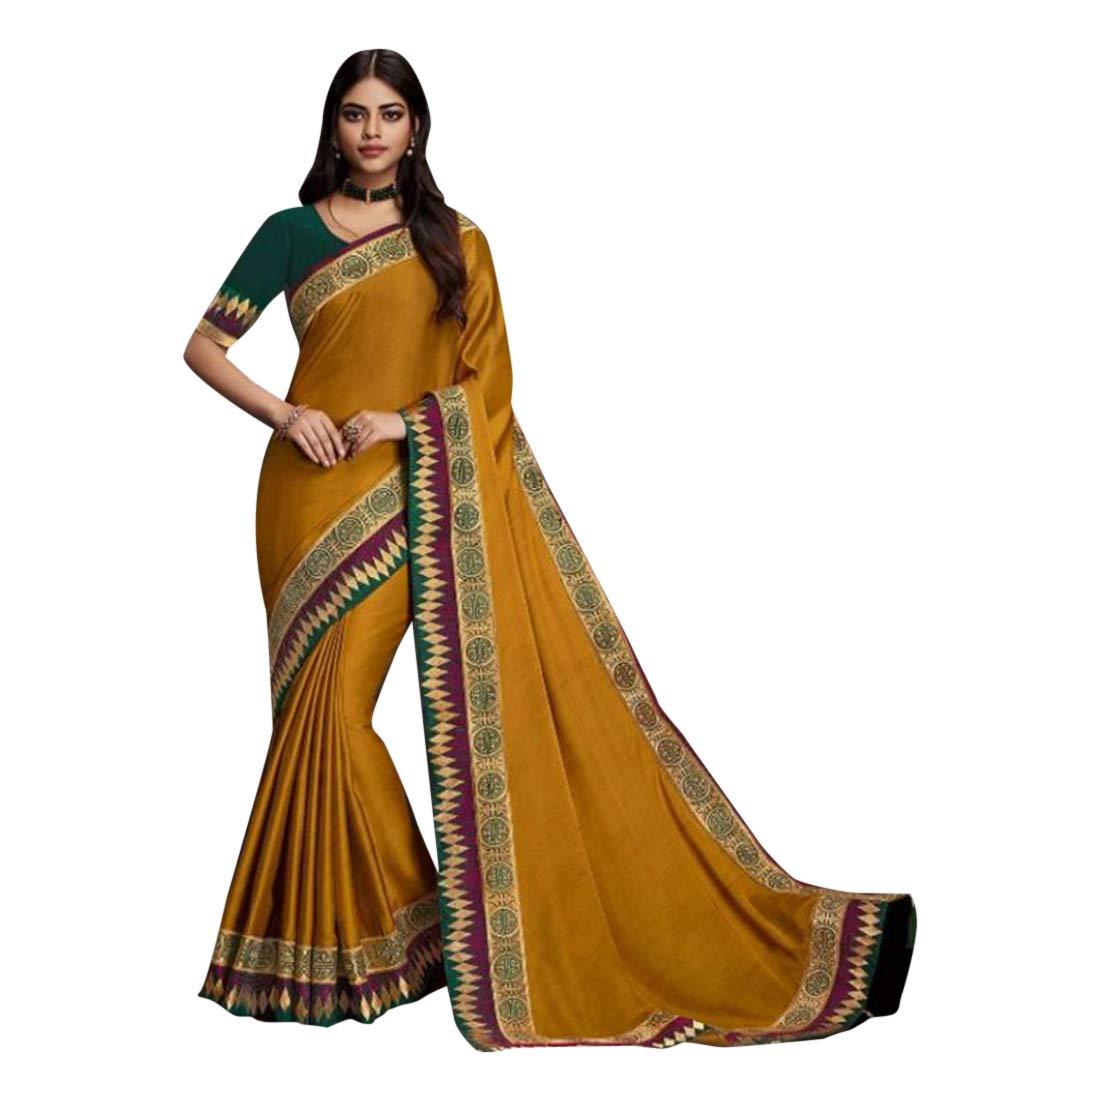 Mustard Plain Border Saree Designer Fern Blouse Evening Wear Party Sari 7493